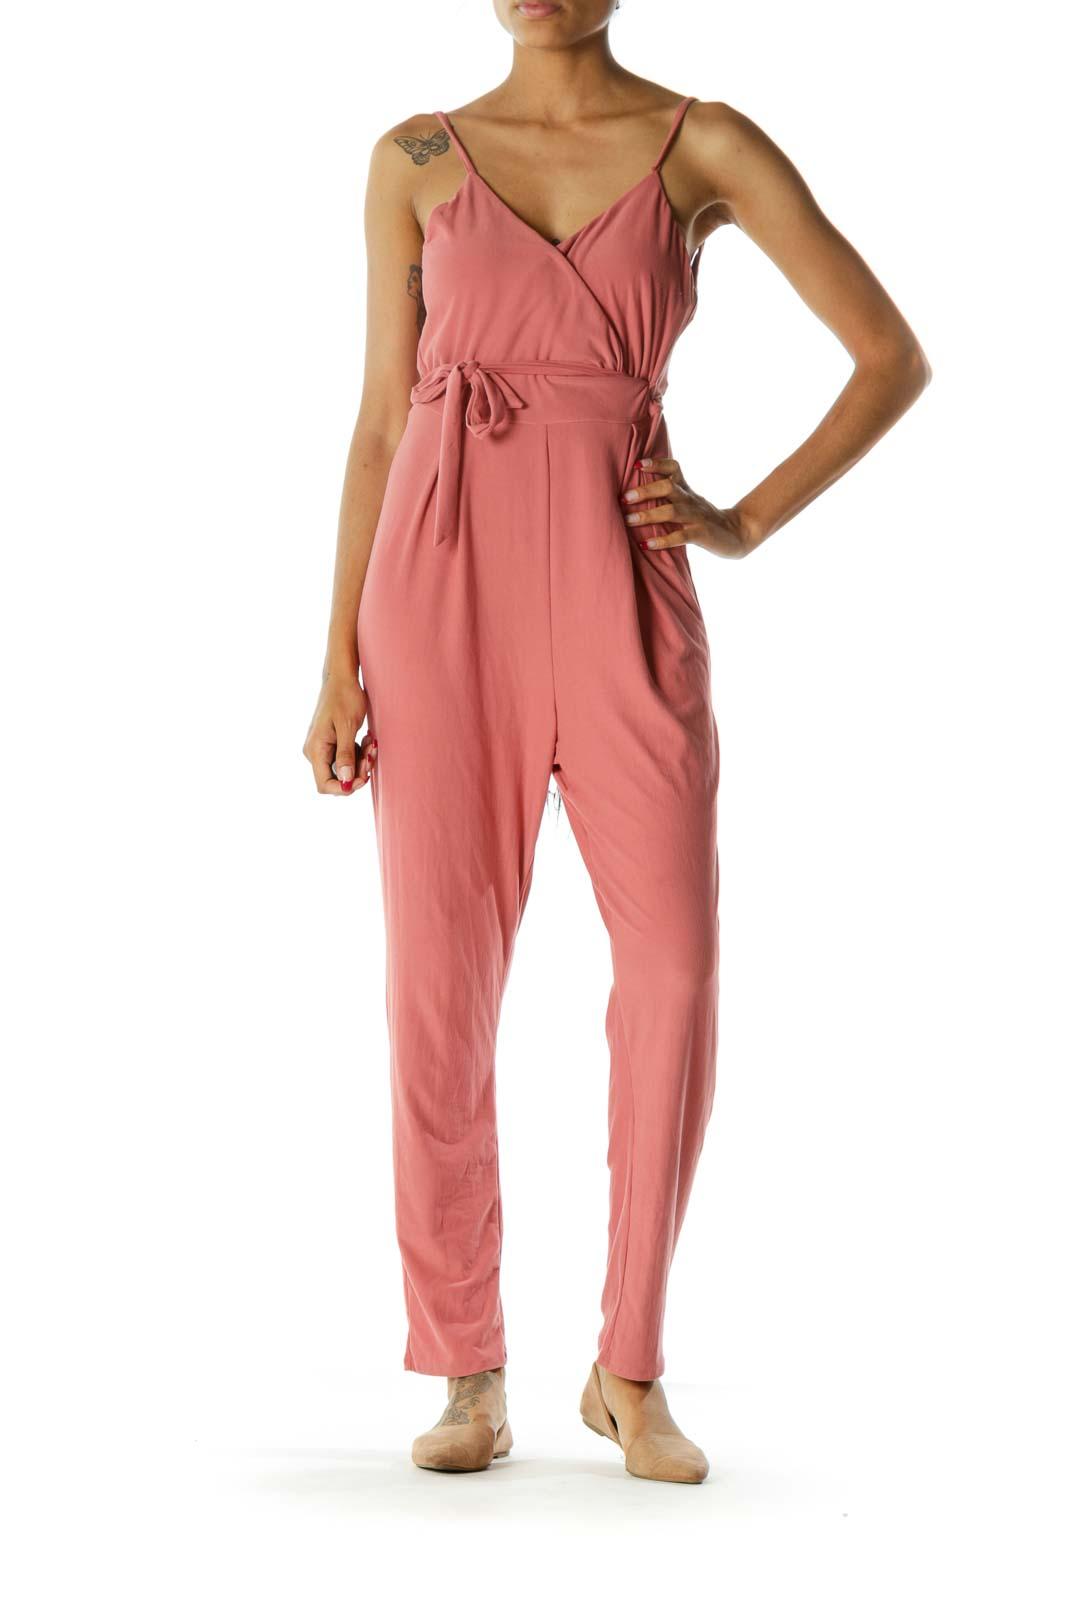 Coral Pink Surplice V-Neck Spaghetti Strap Soft Texture Stretch Jumpsuit